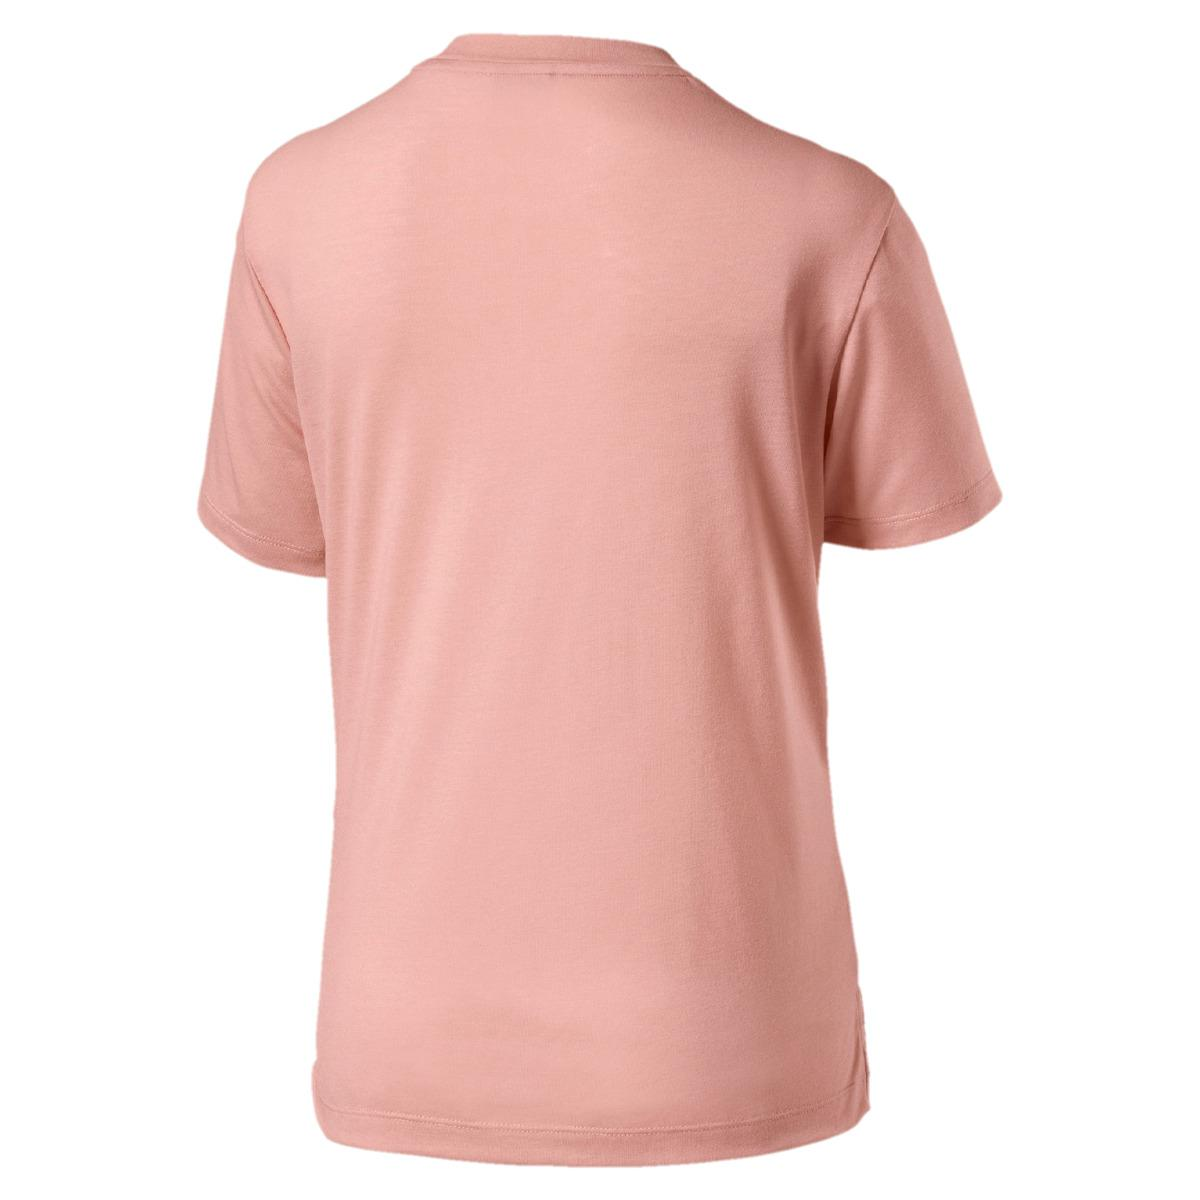 cbeca5ae194 Gallery. Previously sold at: El Corte Ingles · Men's Acne Studios Nimes  Men's Summer T Shirts ...